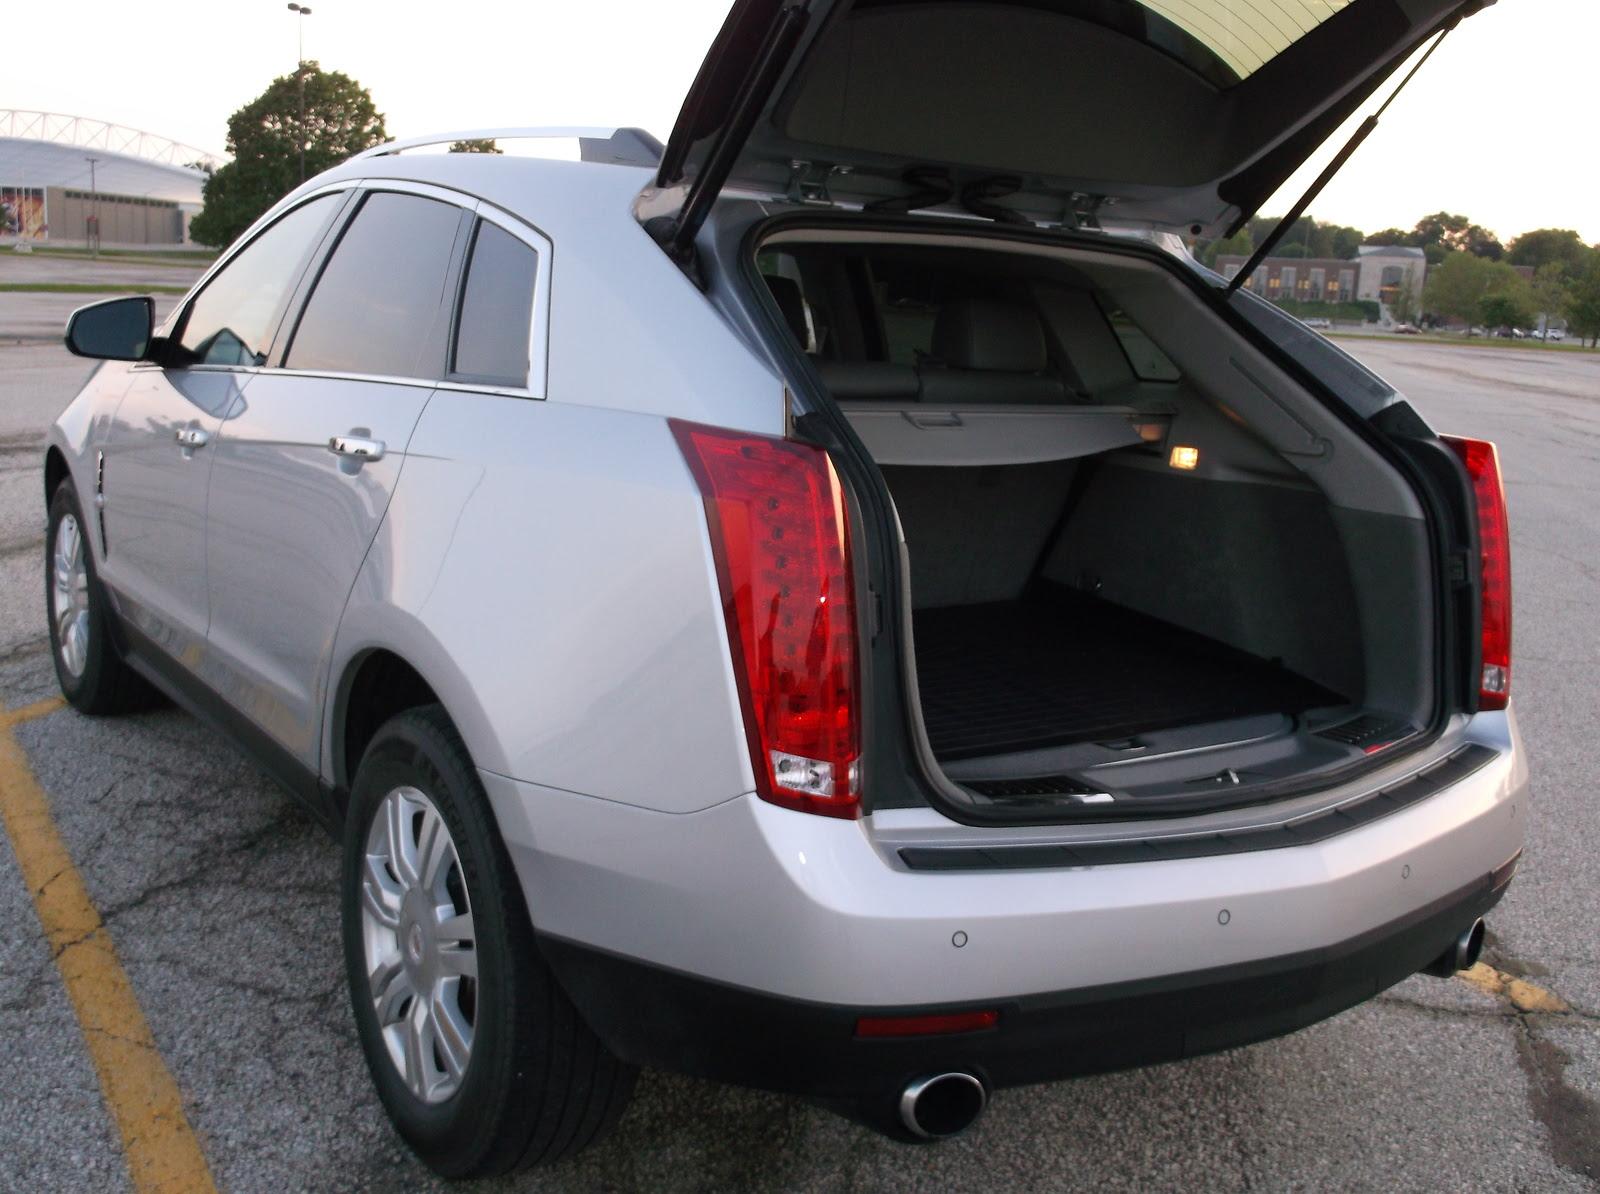 2011 Cadillac SRX - Review - CarGurus